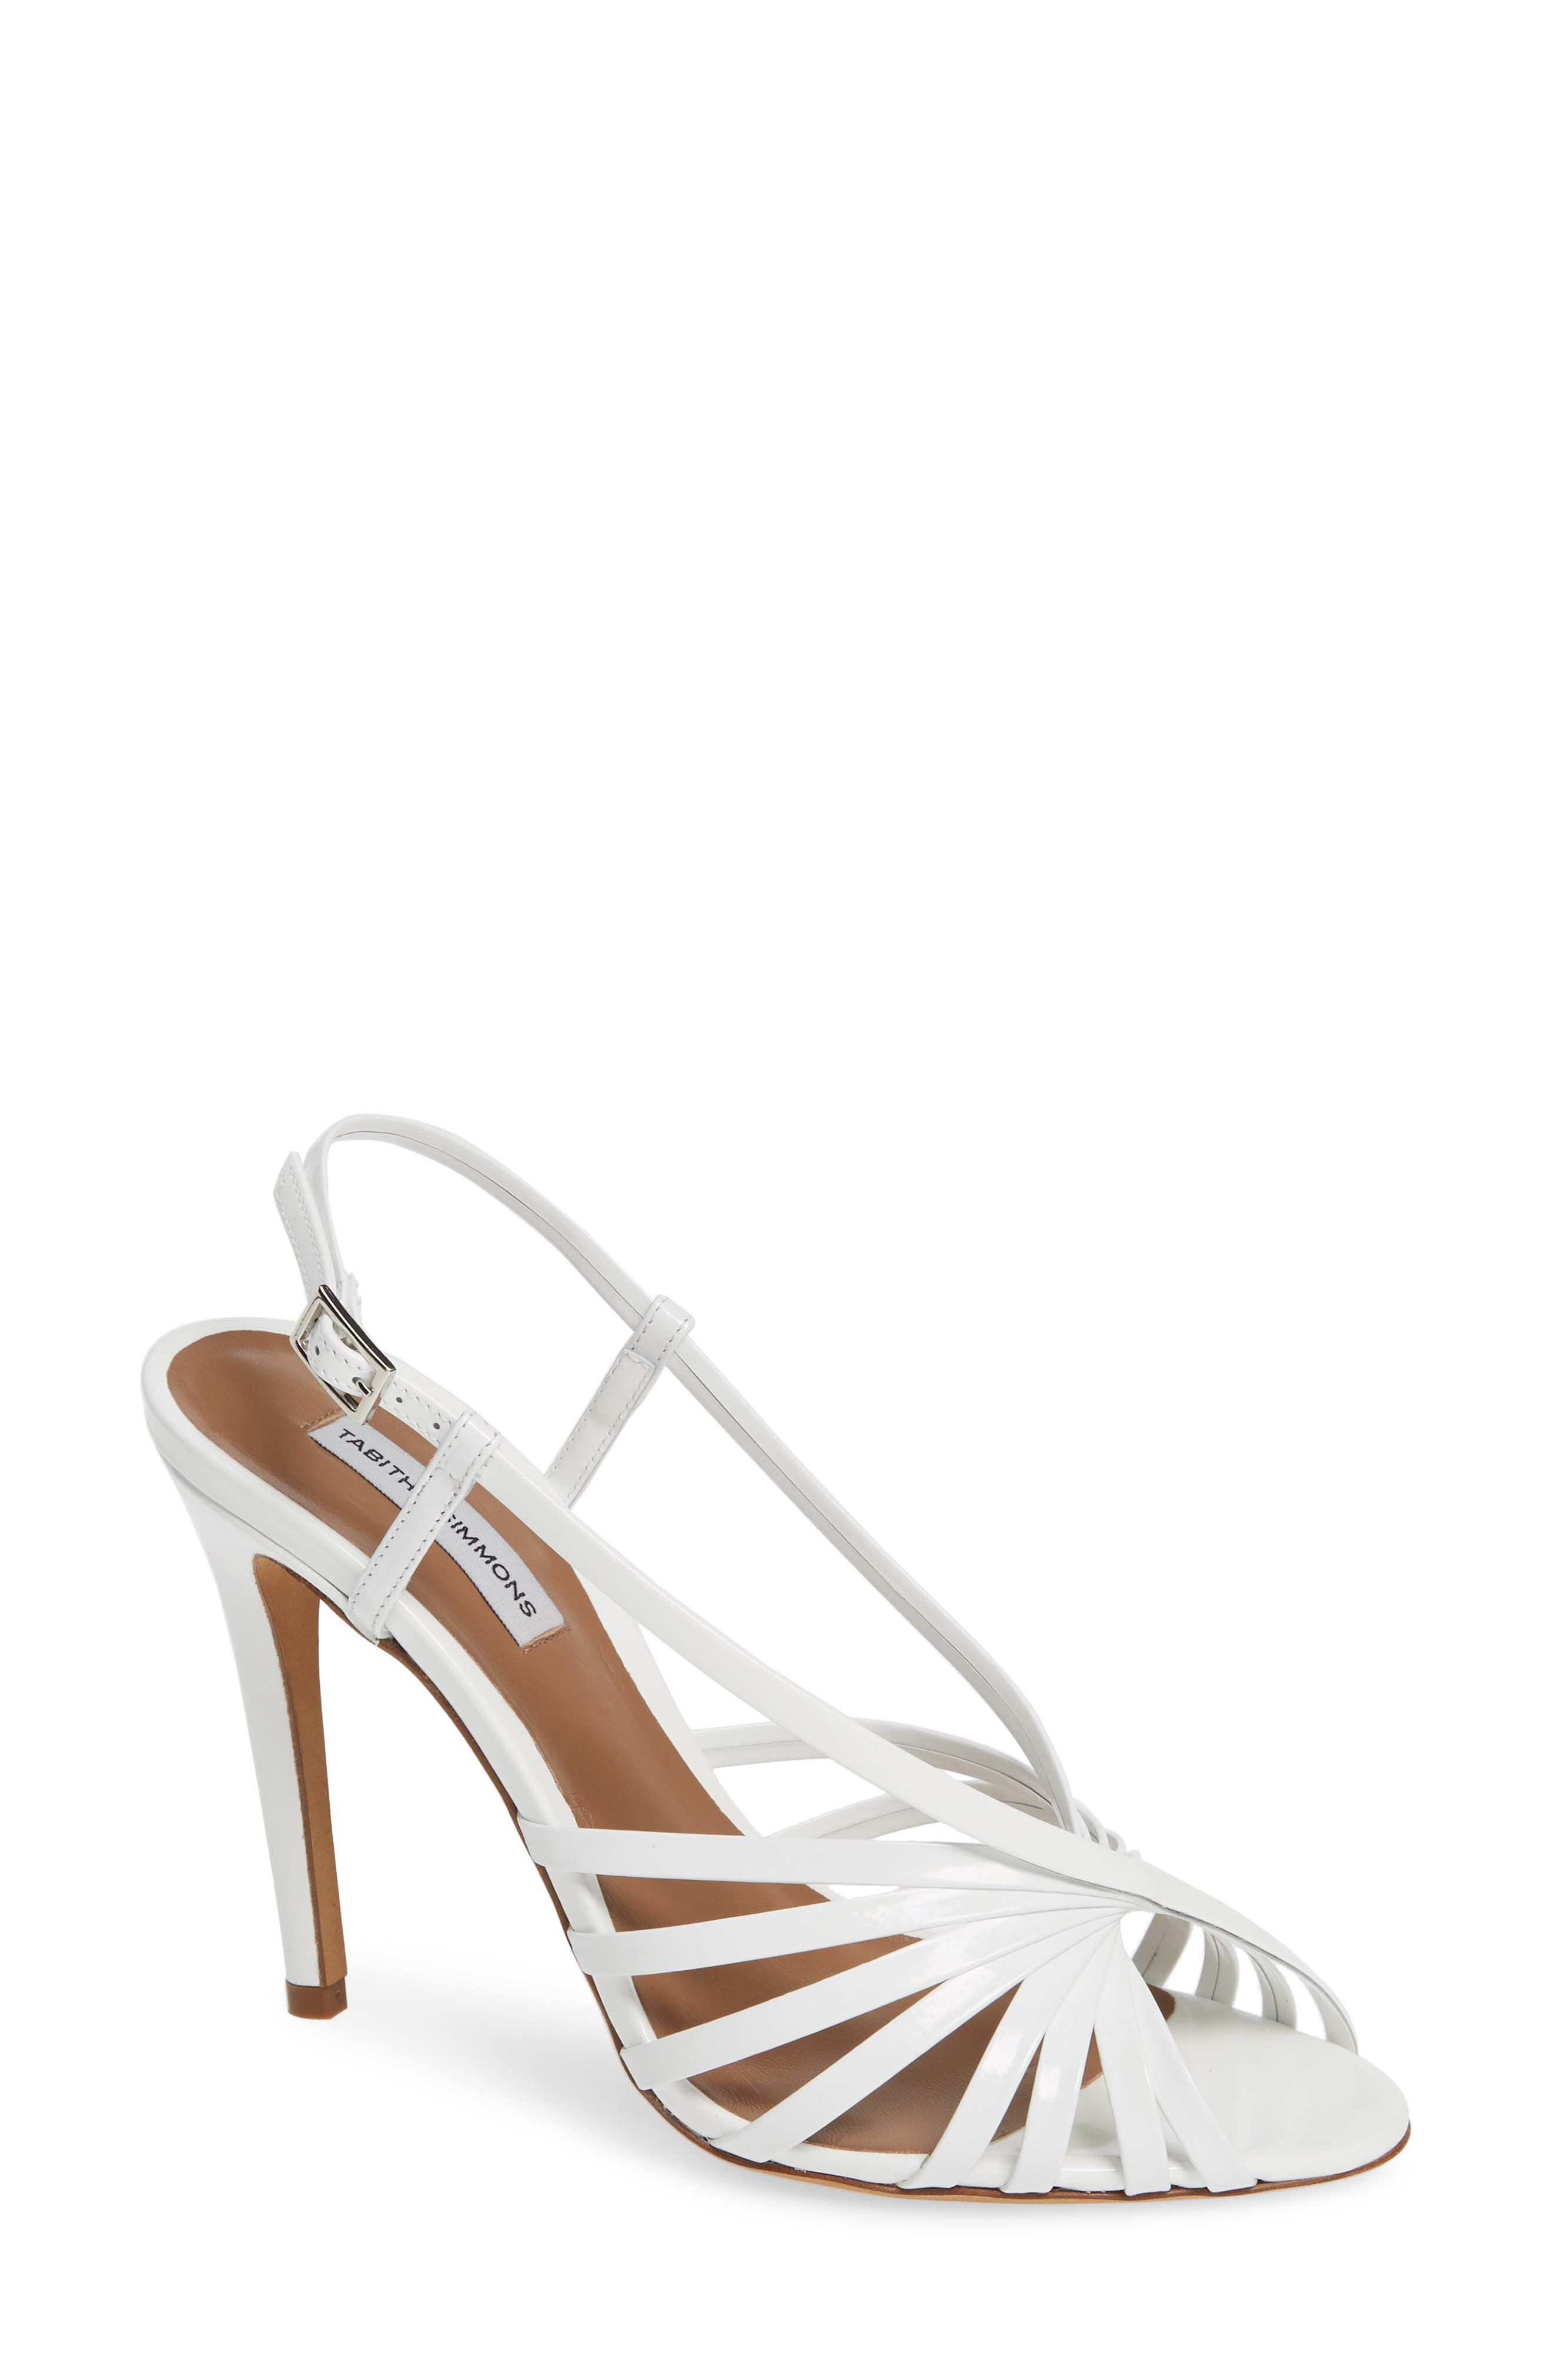 Tabitha Simmons Jazz Strappy Sandal, White